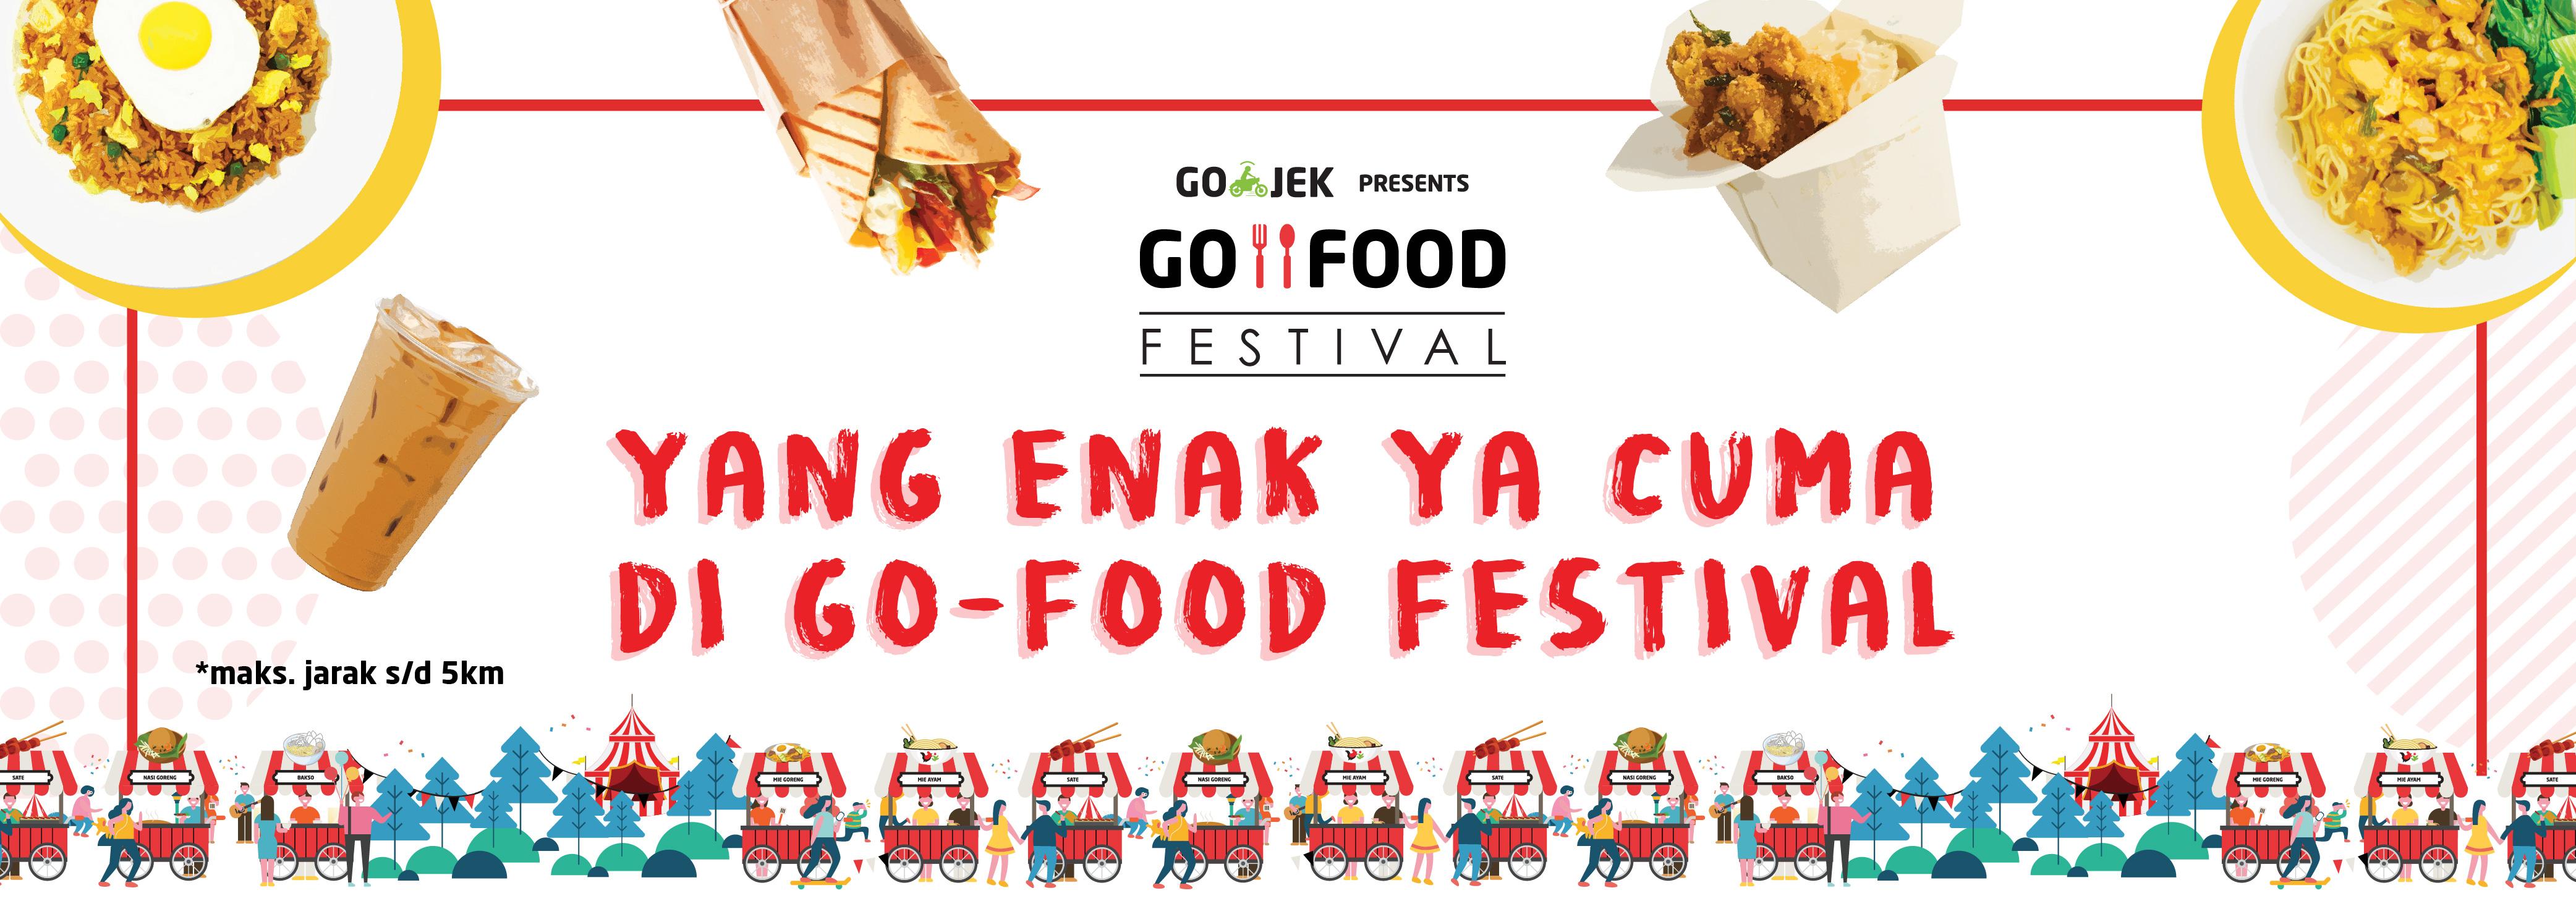 Festival Kuliner Jogja Cashback Hingga 50 Di Gofood Festival Yogyakarta Gofood Festival